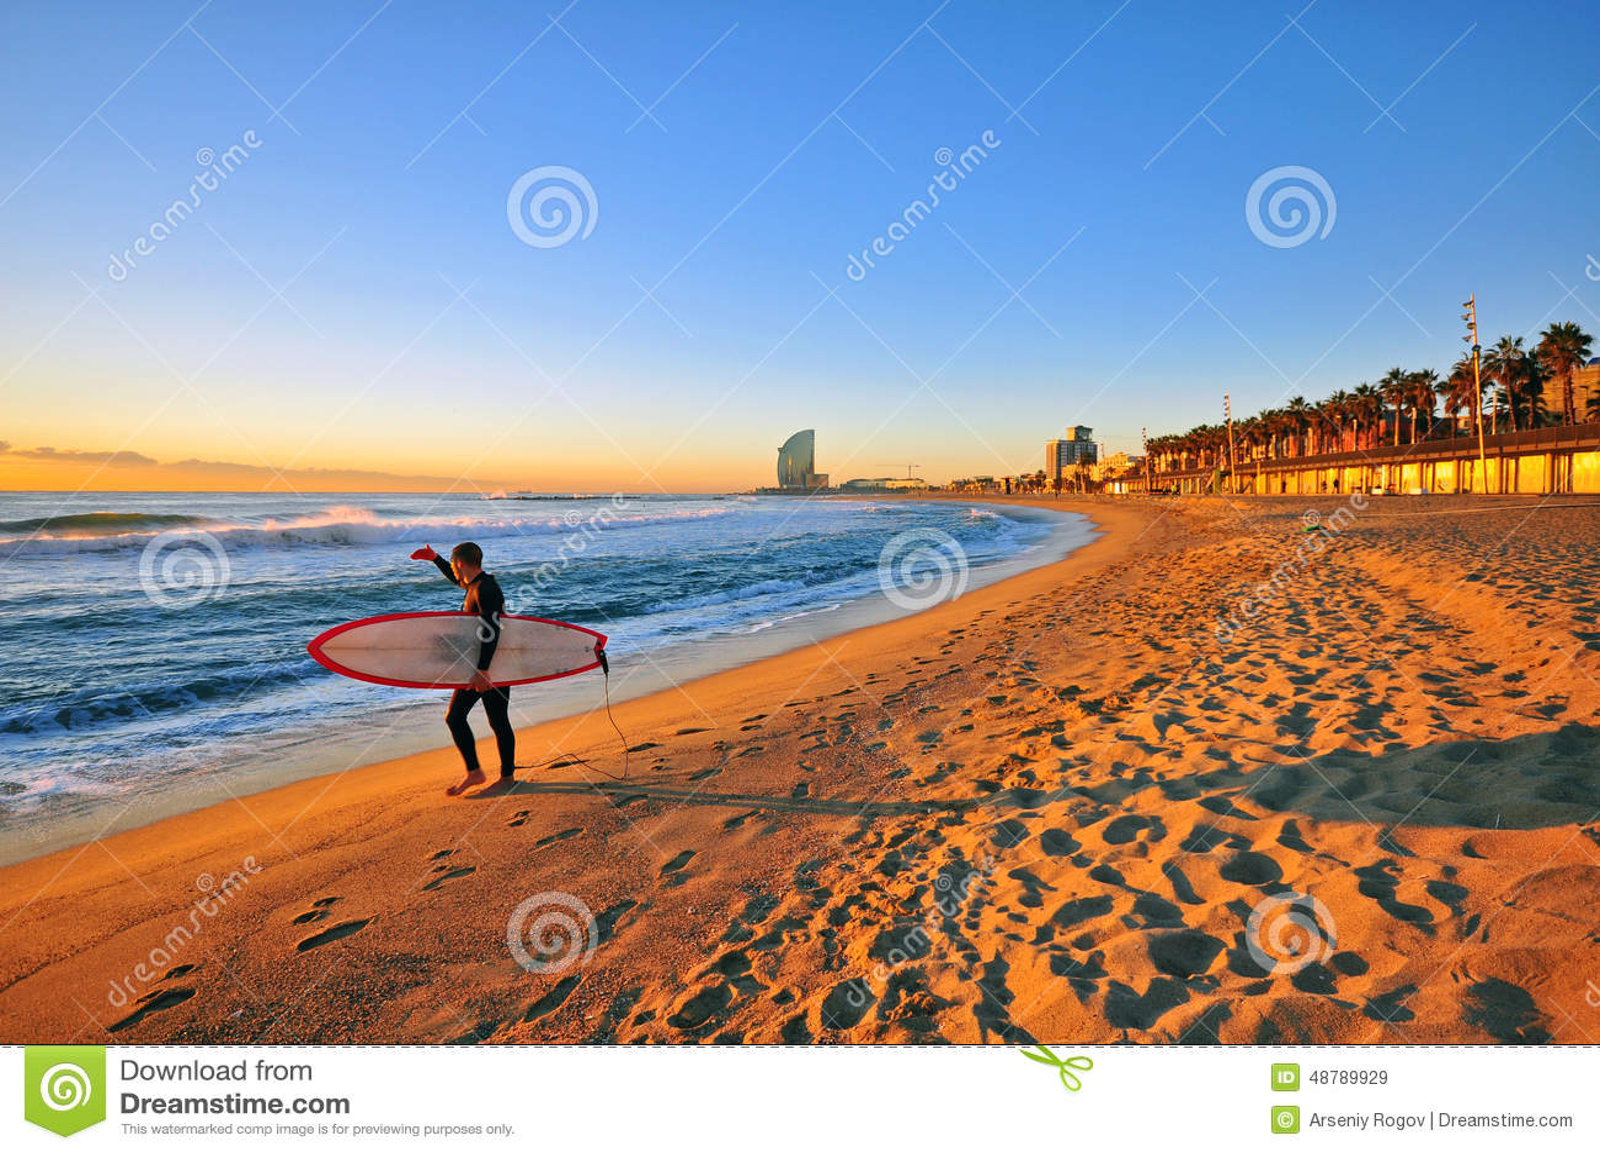 Surfing in Barcelona